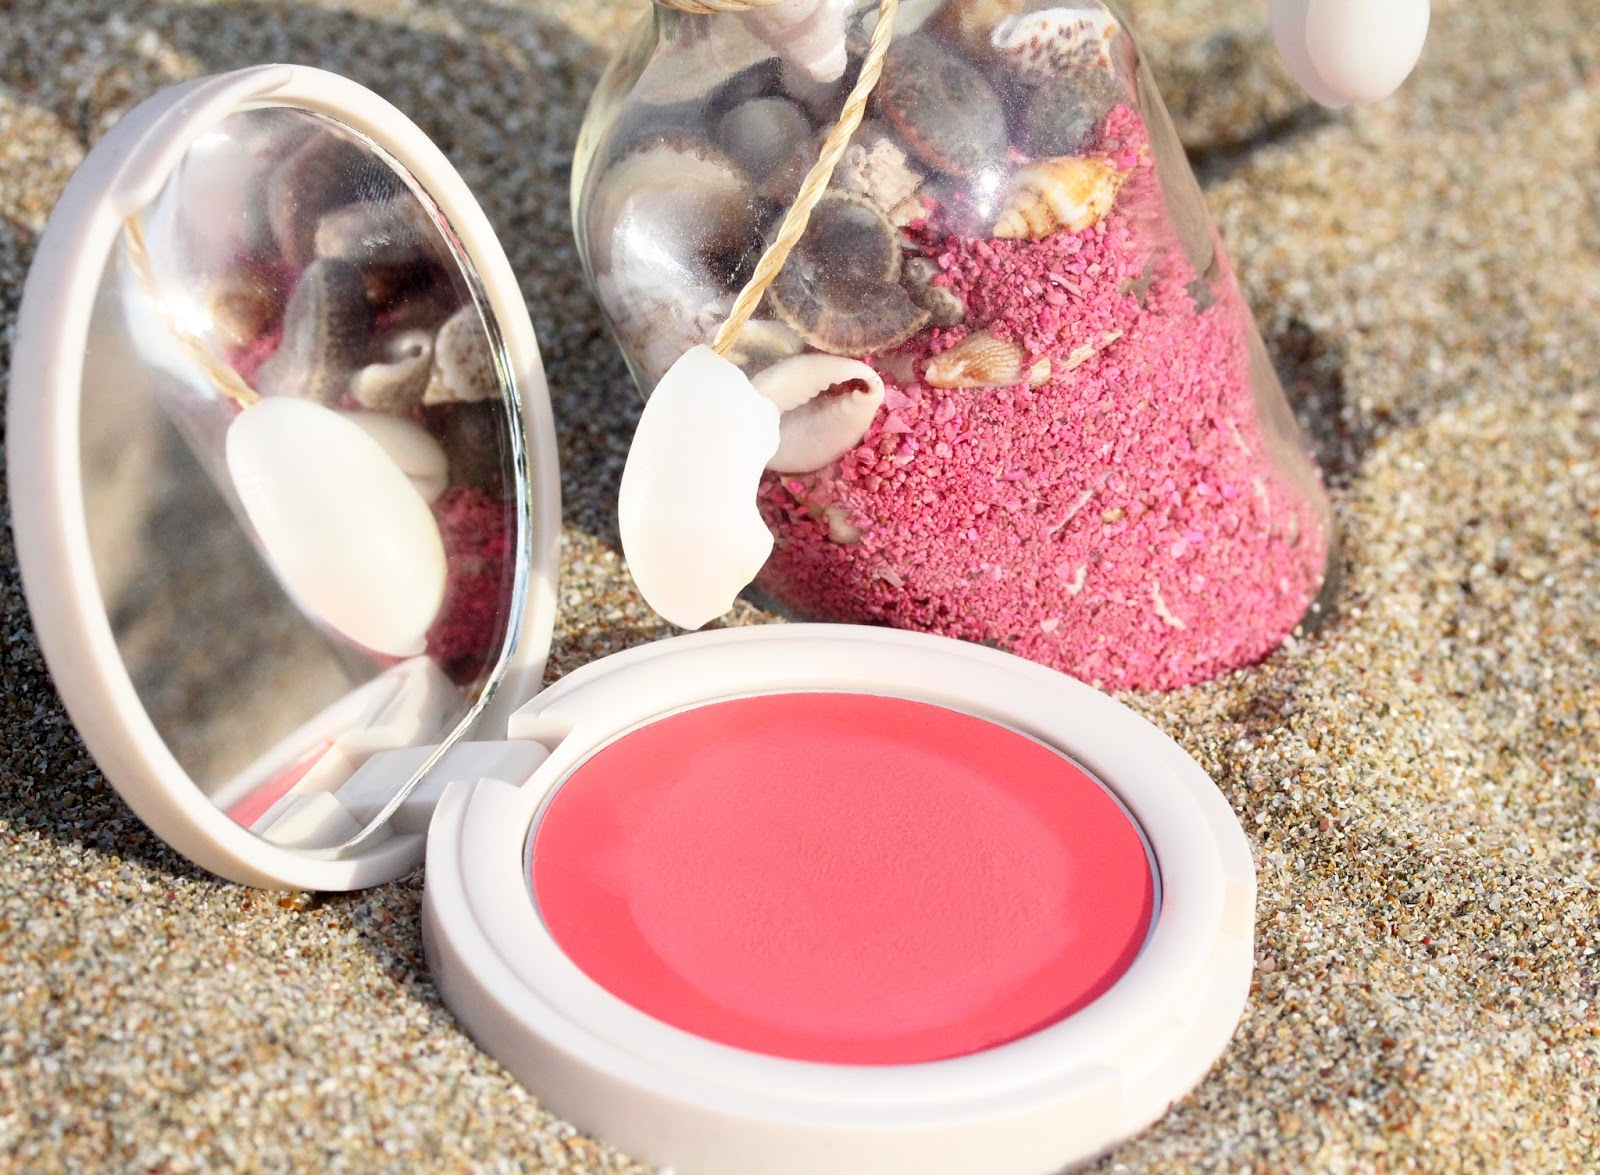 Topshop Cream blush in Flush